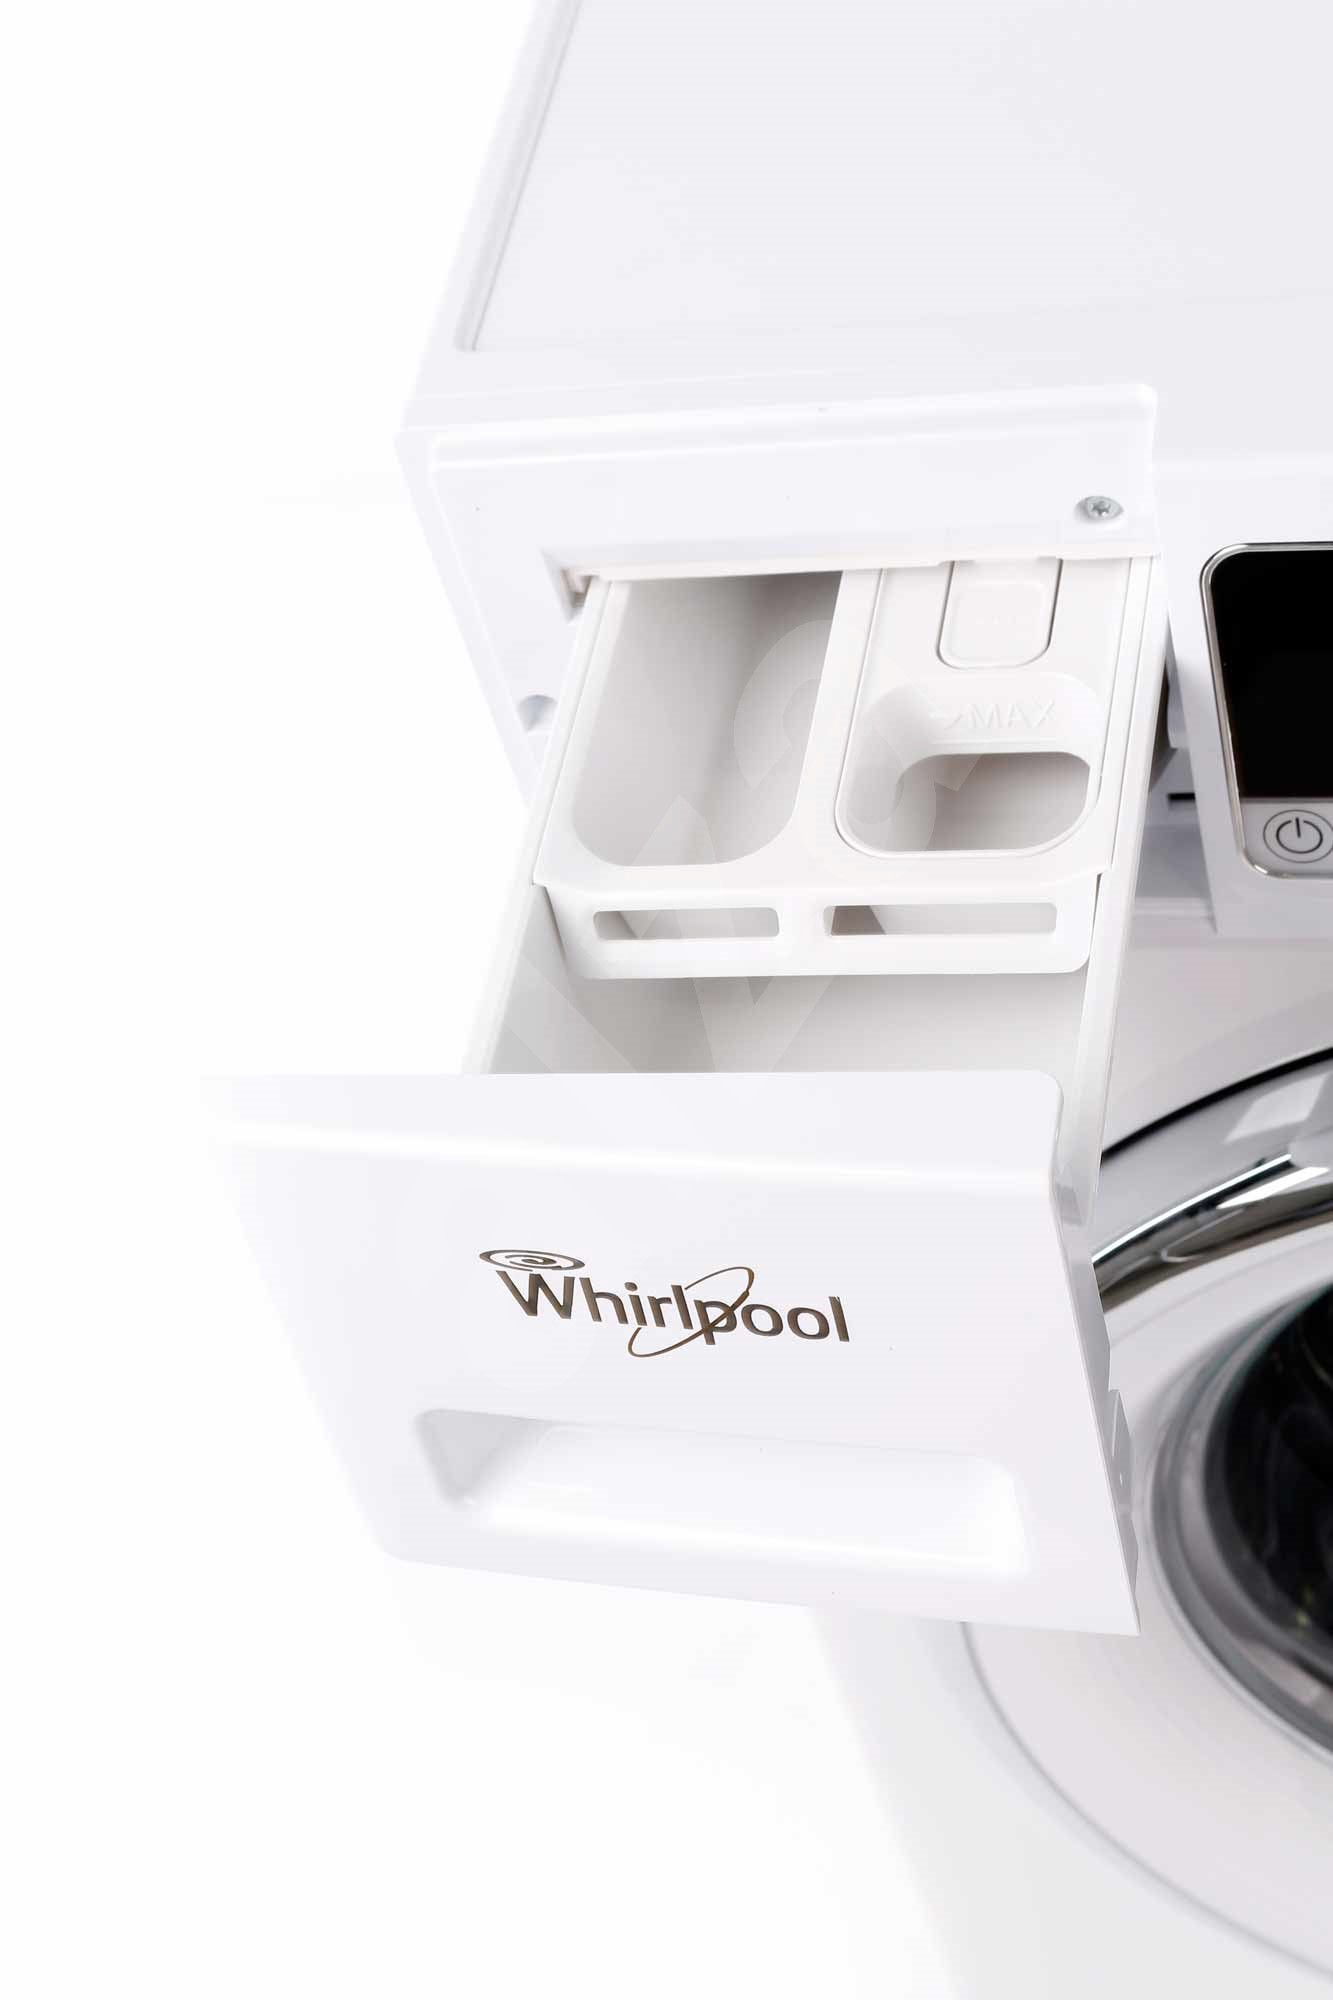 whirlpool fscr 80421 20 let z ruka na motor zen pra ka. Black Bedroom Furniture Sets. Home Design Ideas